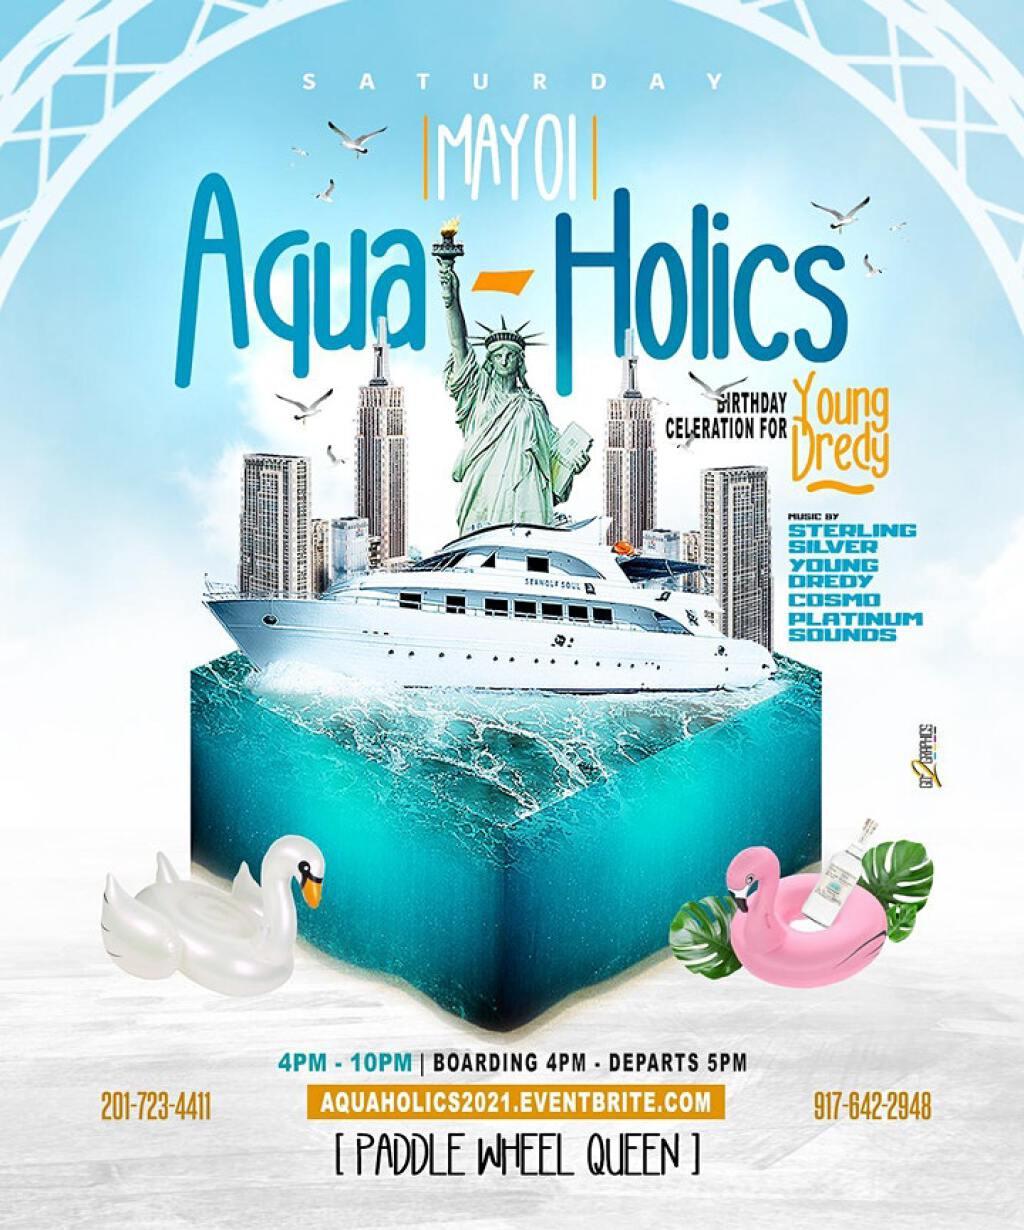 Aqua-Holics Boatride flyer or graphic.